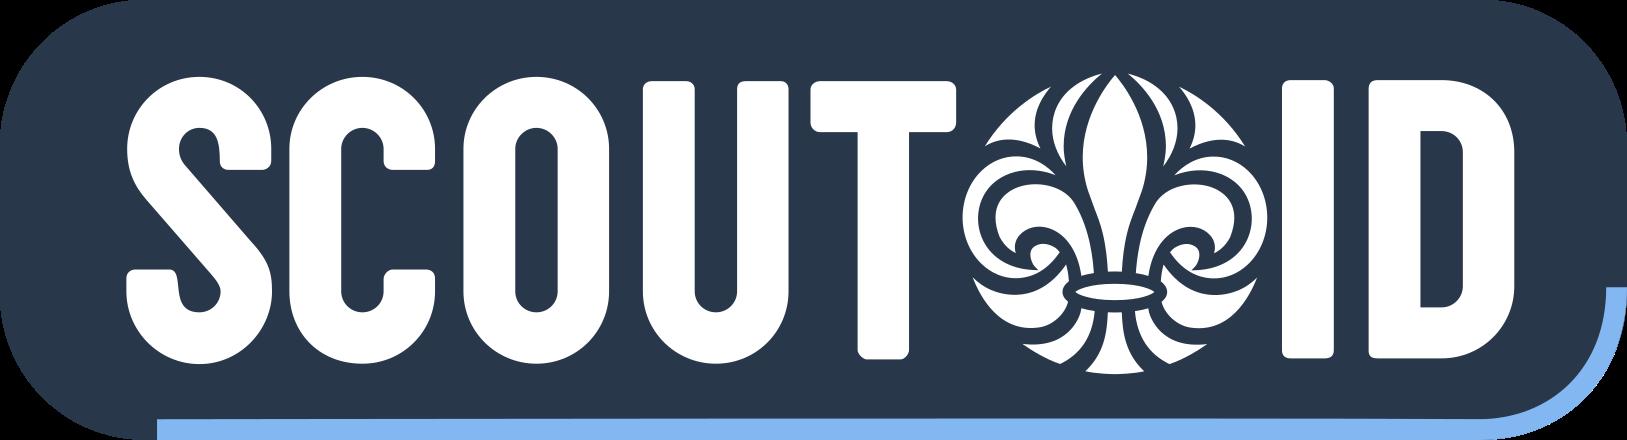 Knapp logga in med ScoutID